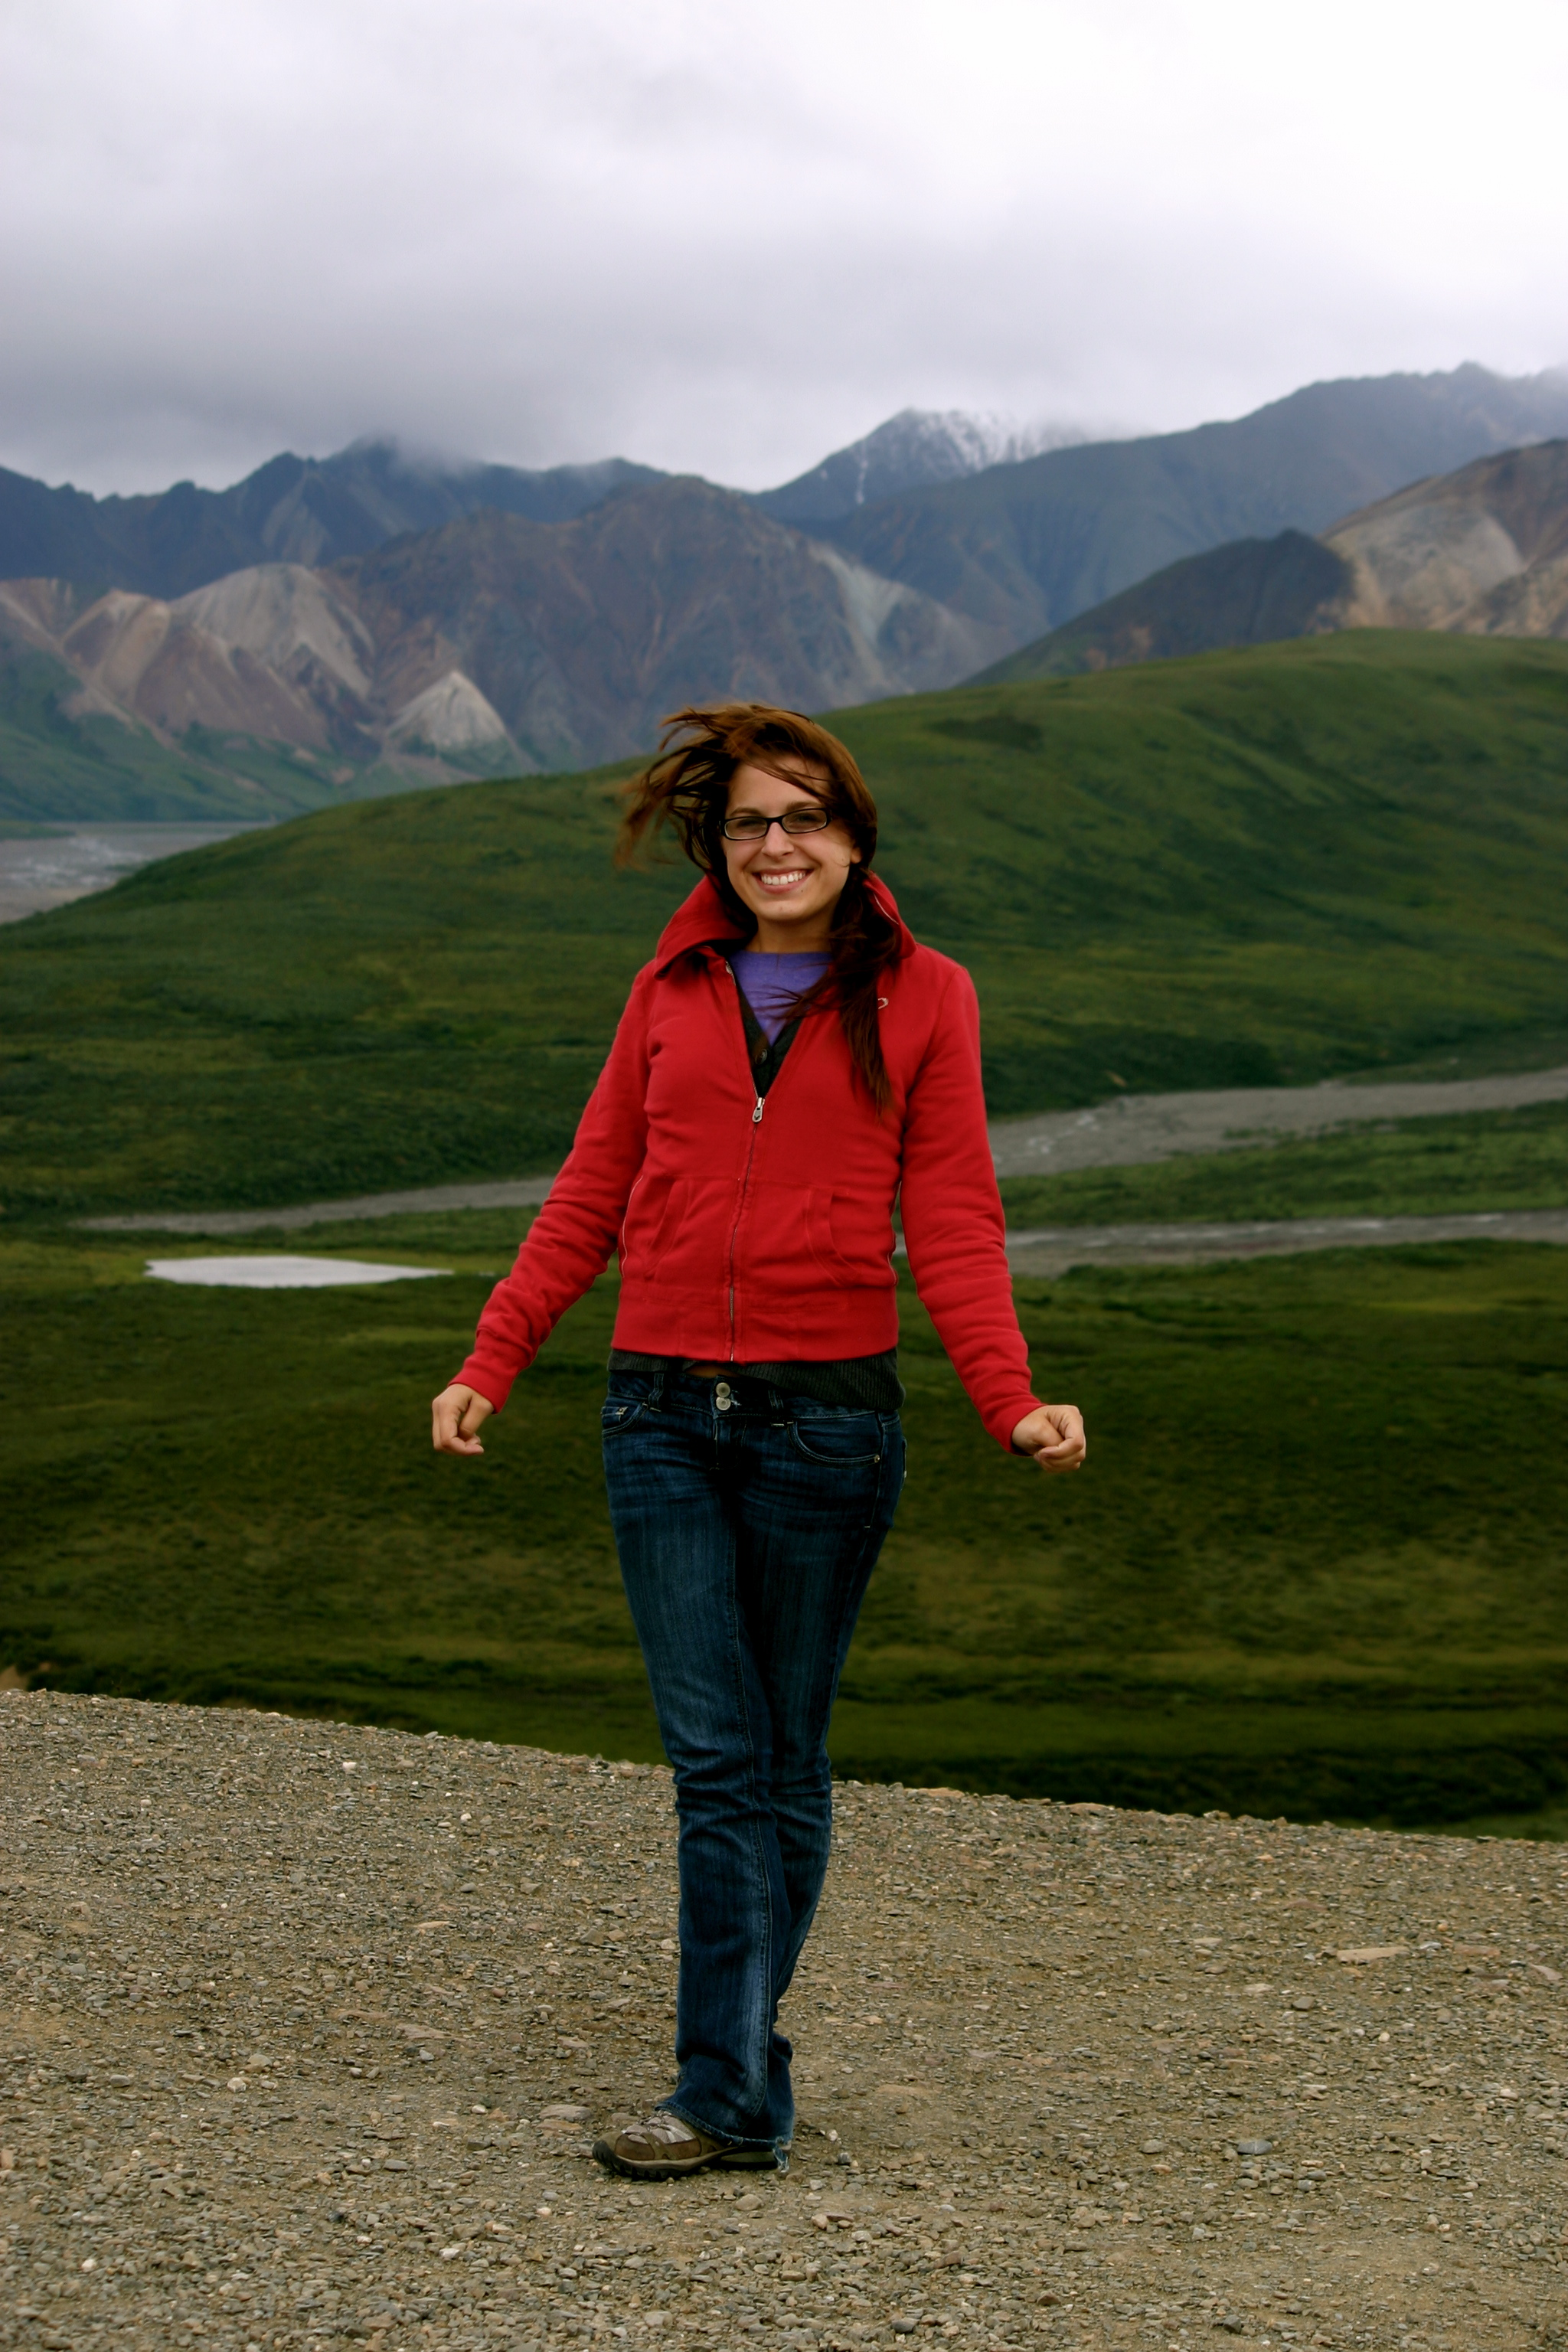 Me at Denali National Park